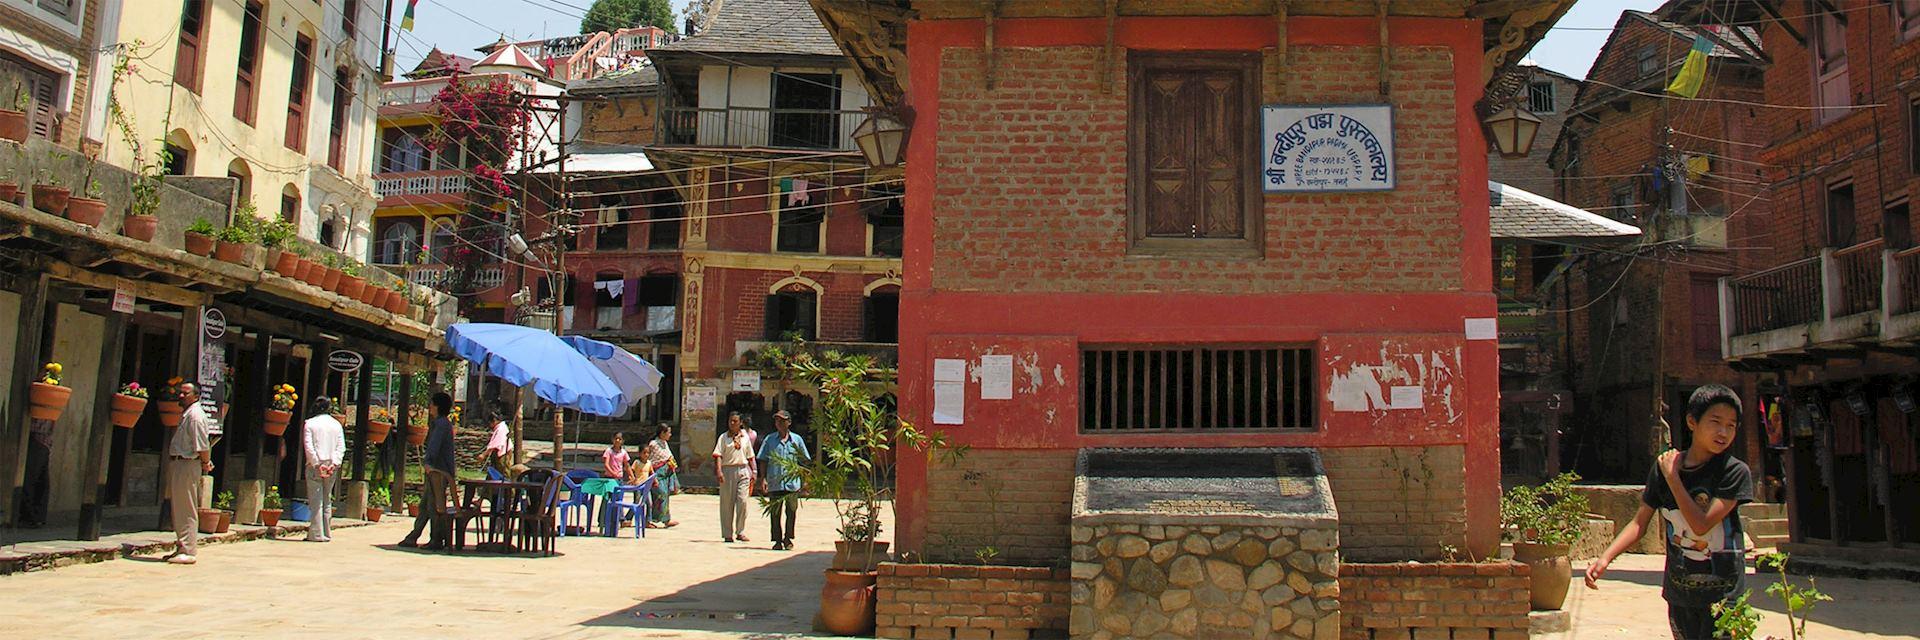 Main street in Bandipur, Nepal